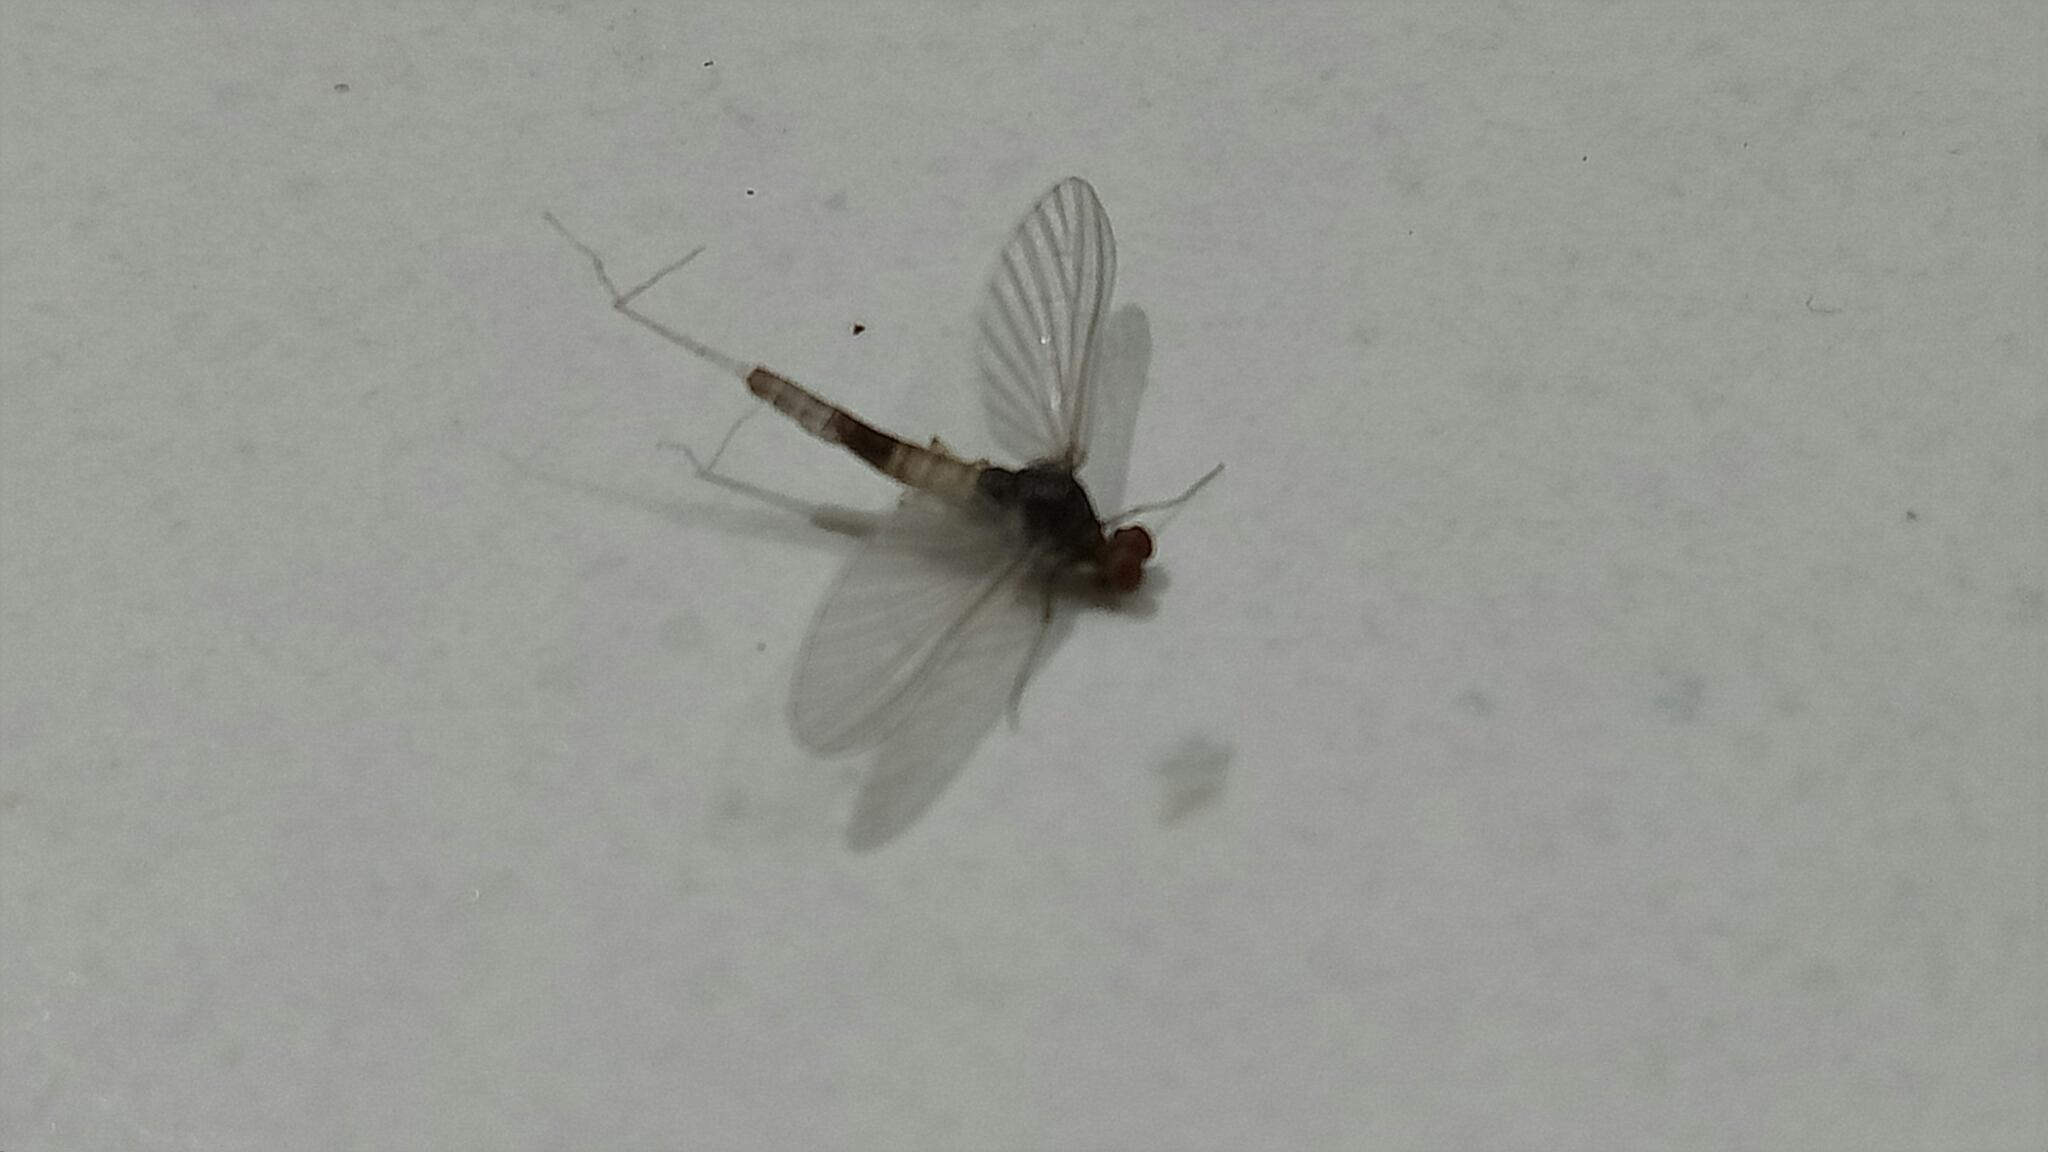 Image: mayflies  (Ephemeroptera)  by beach  CC BY-NC